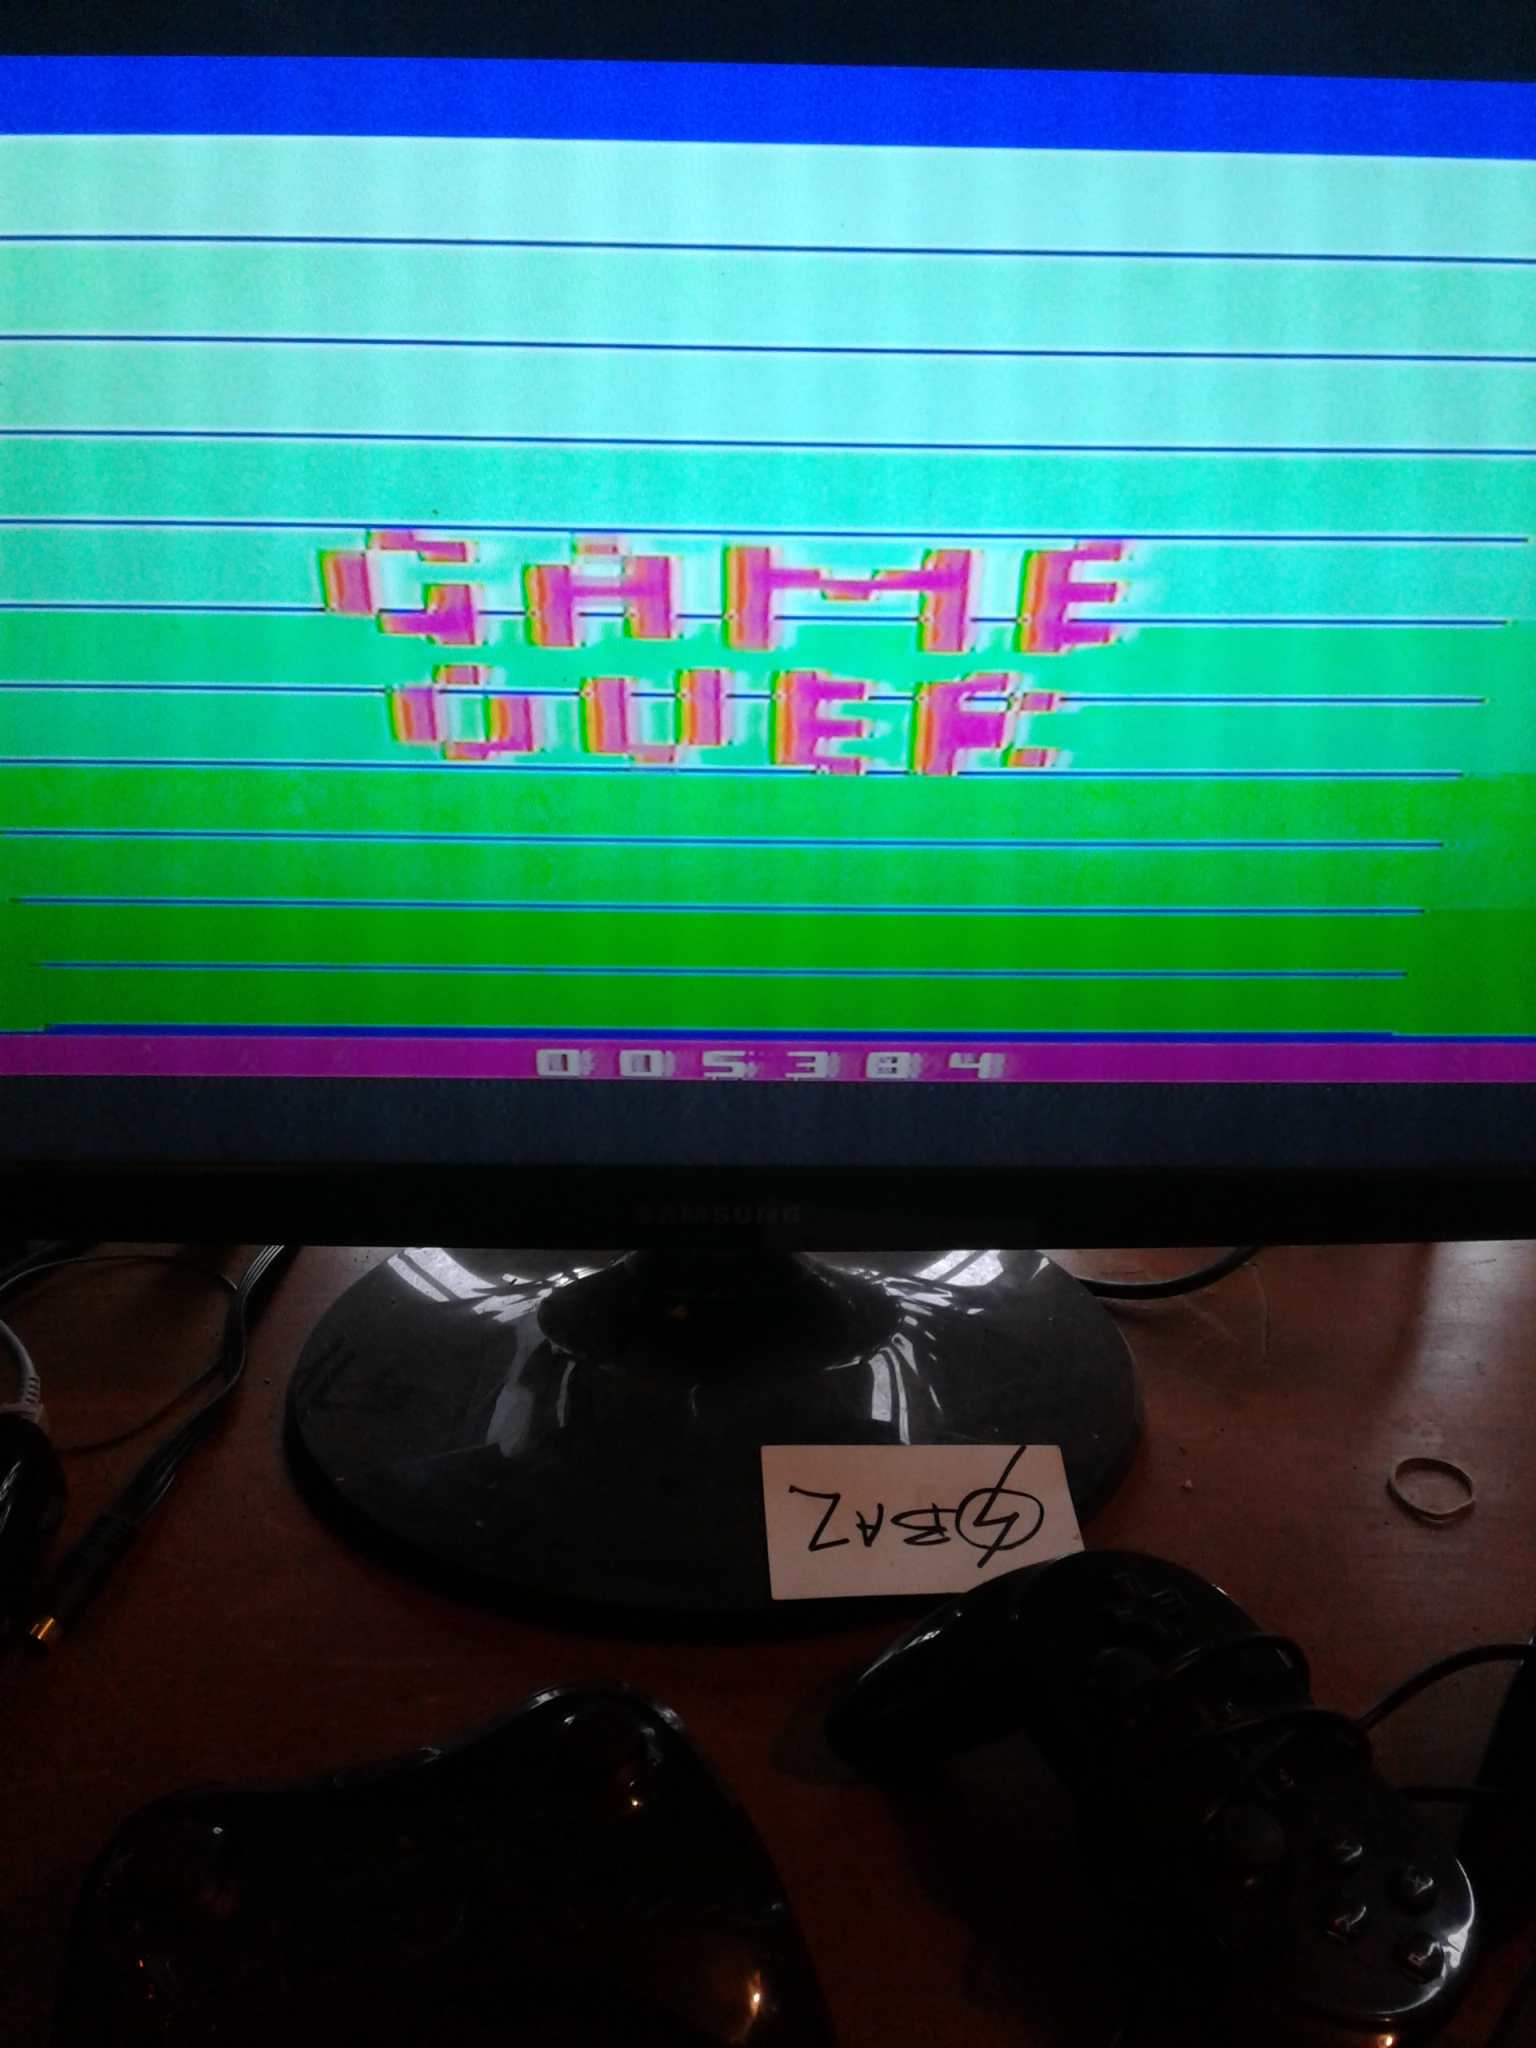 S.BAZ: Seaweed Assault (Atari 2600 Novice/B) 5,384 points on 2020-04-19 17:33:06